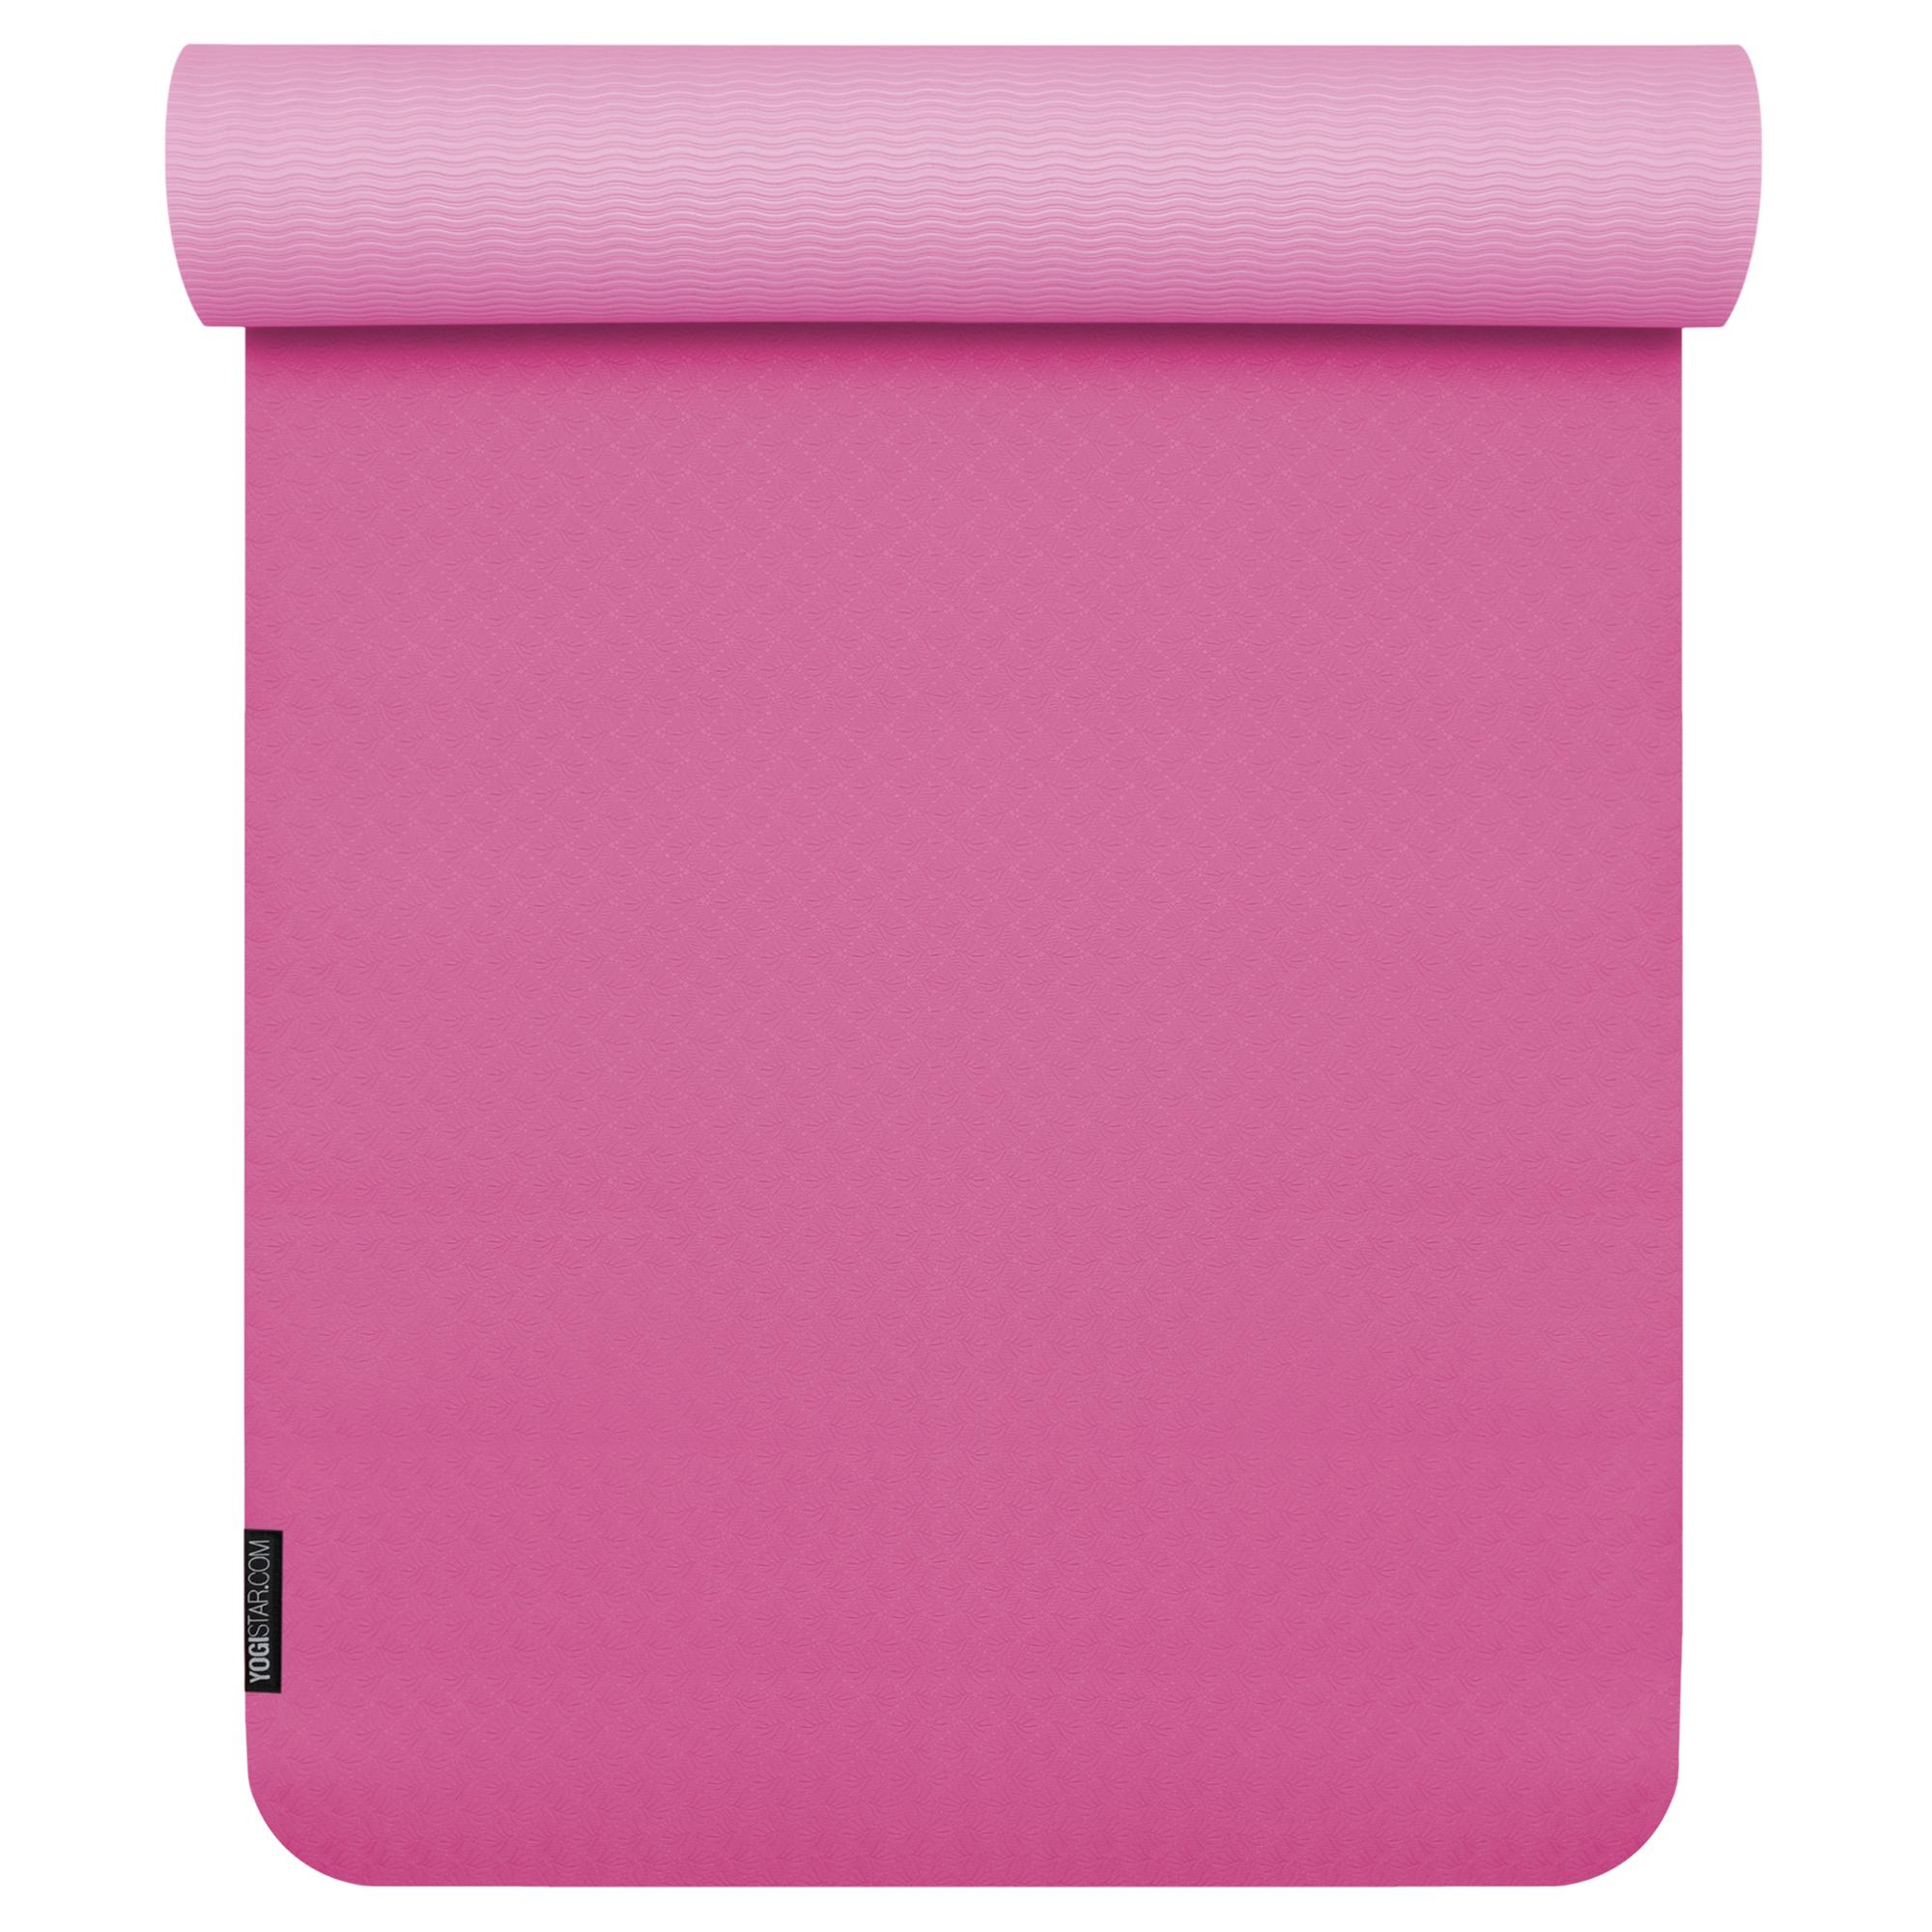 Yoga mat 'Pro'